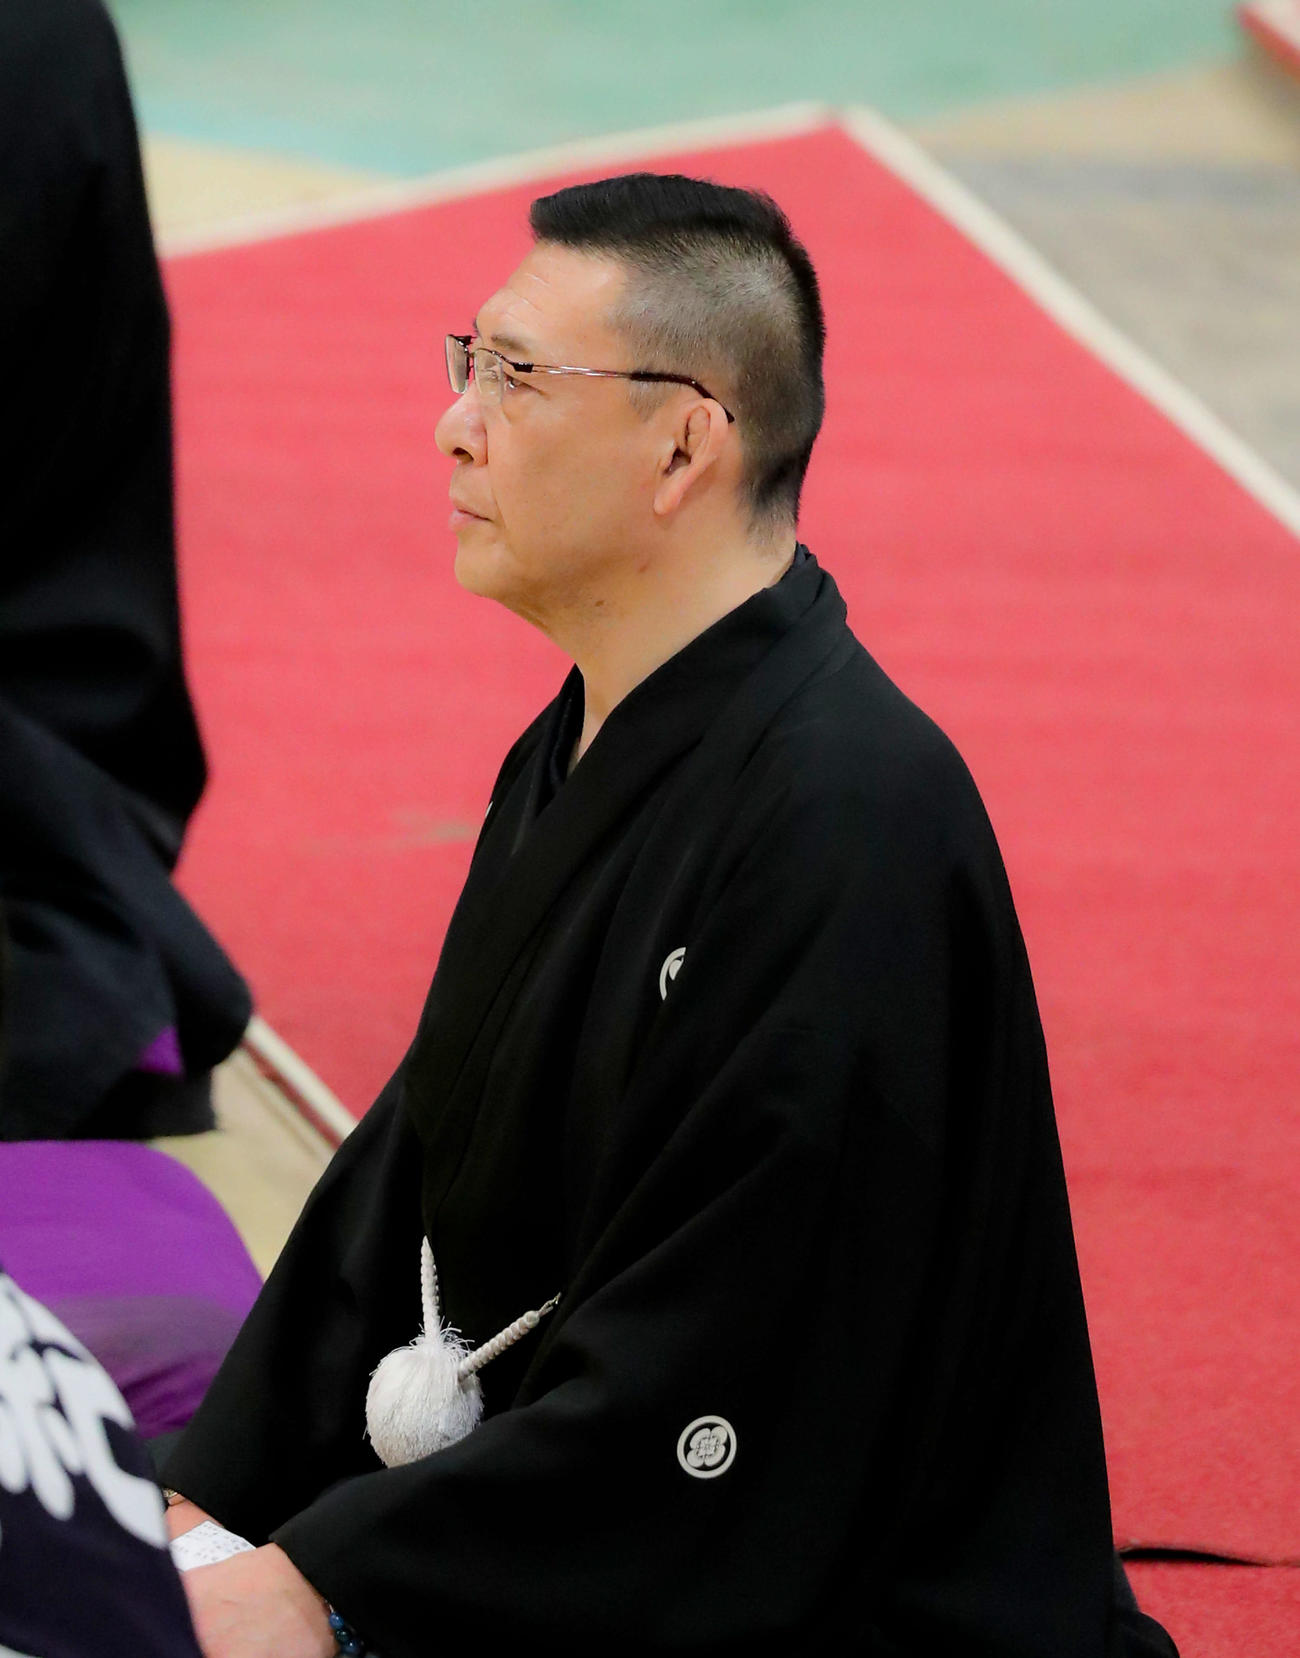 中川親方(2020年3月15日)